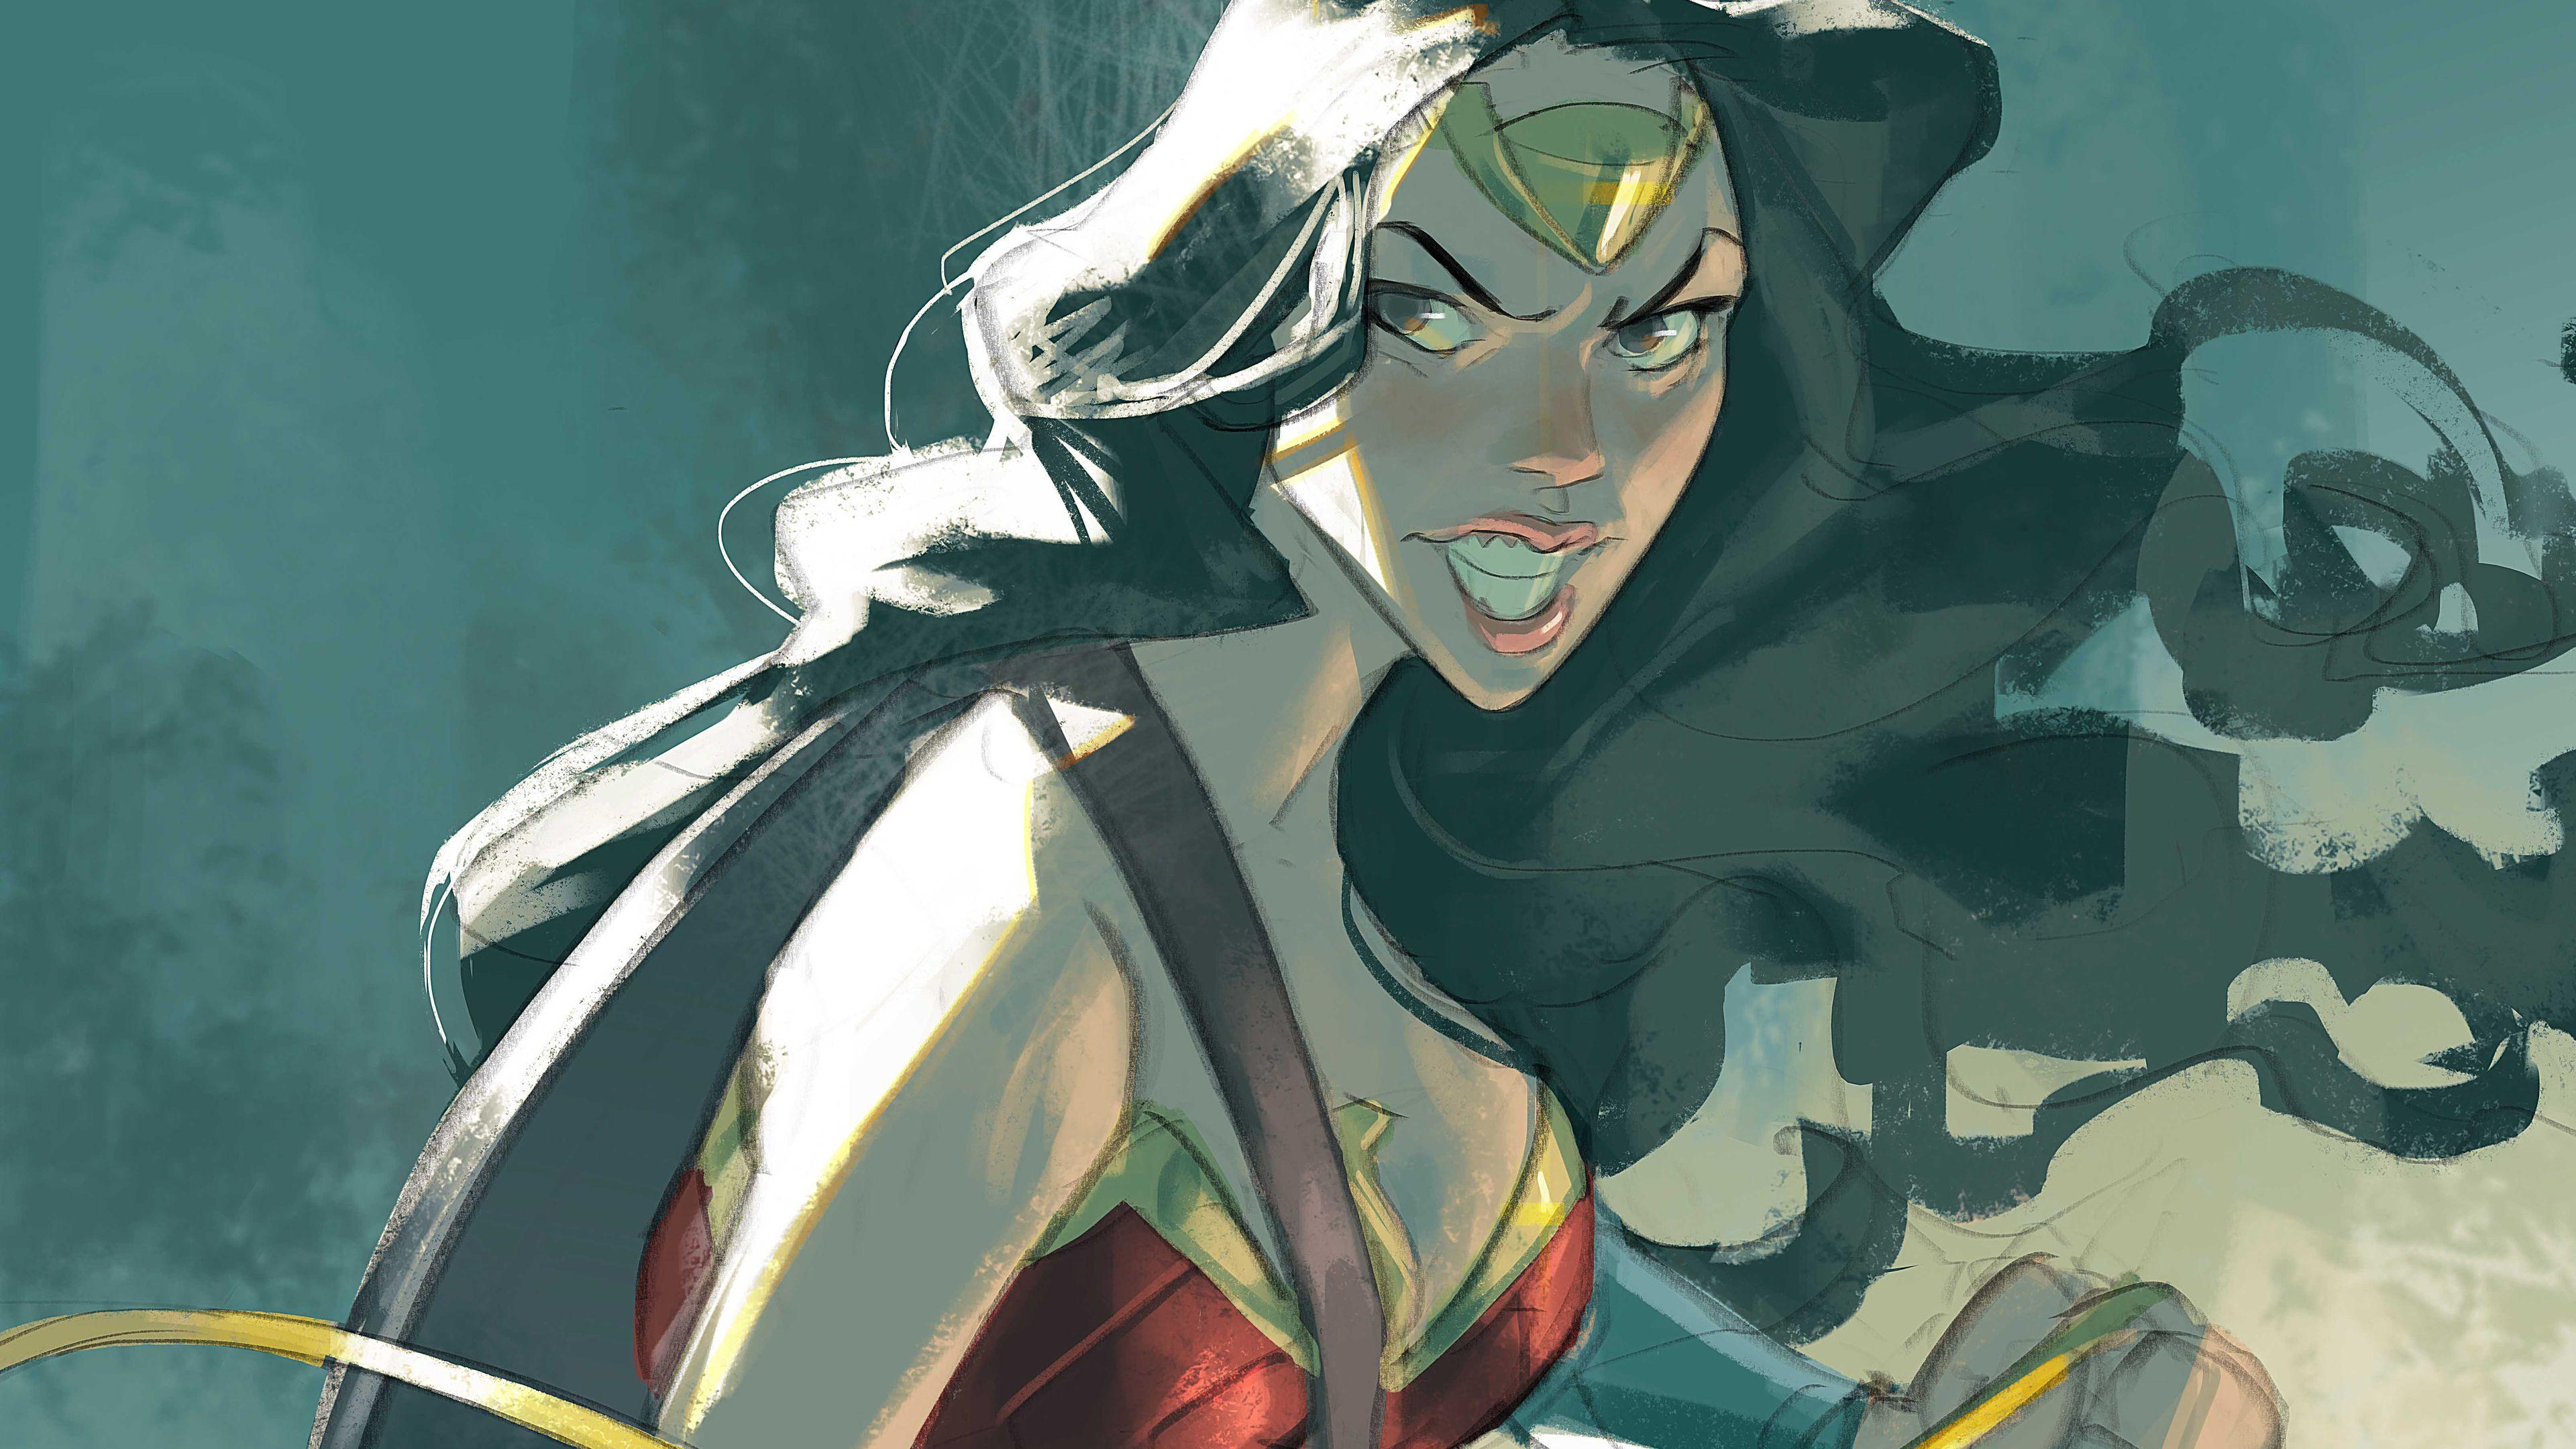 Wallpaper 4k Wonder Woman 5k Artwork 4kwallpapers, 5k